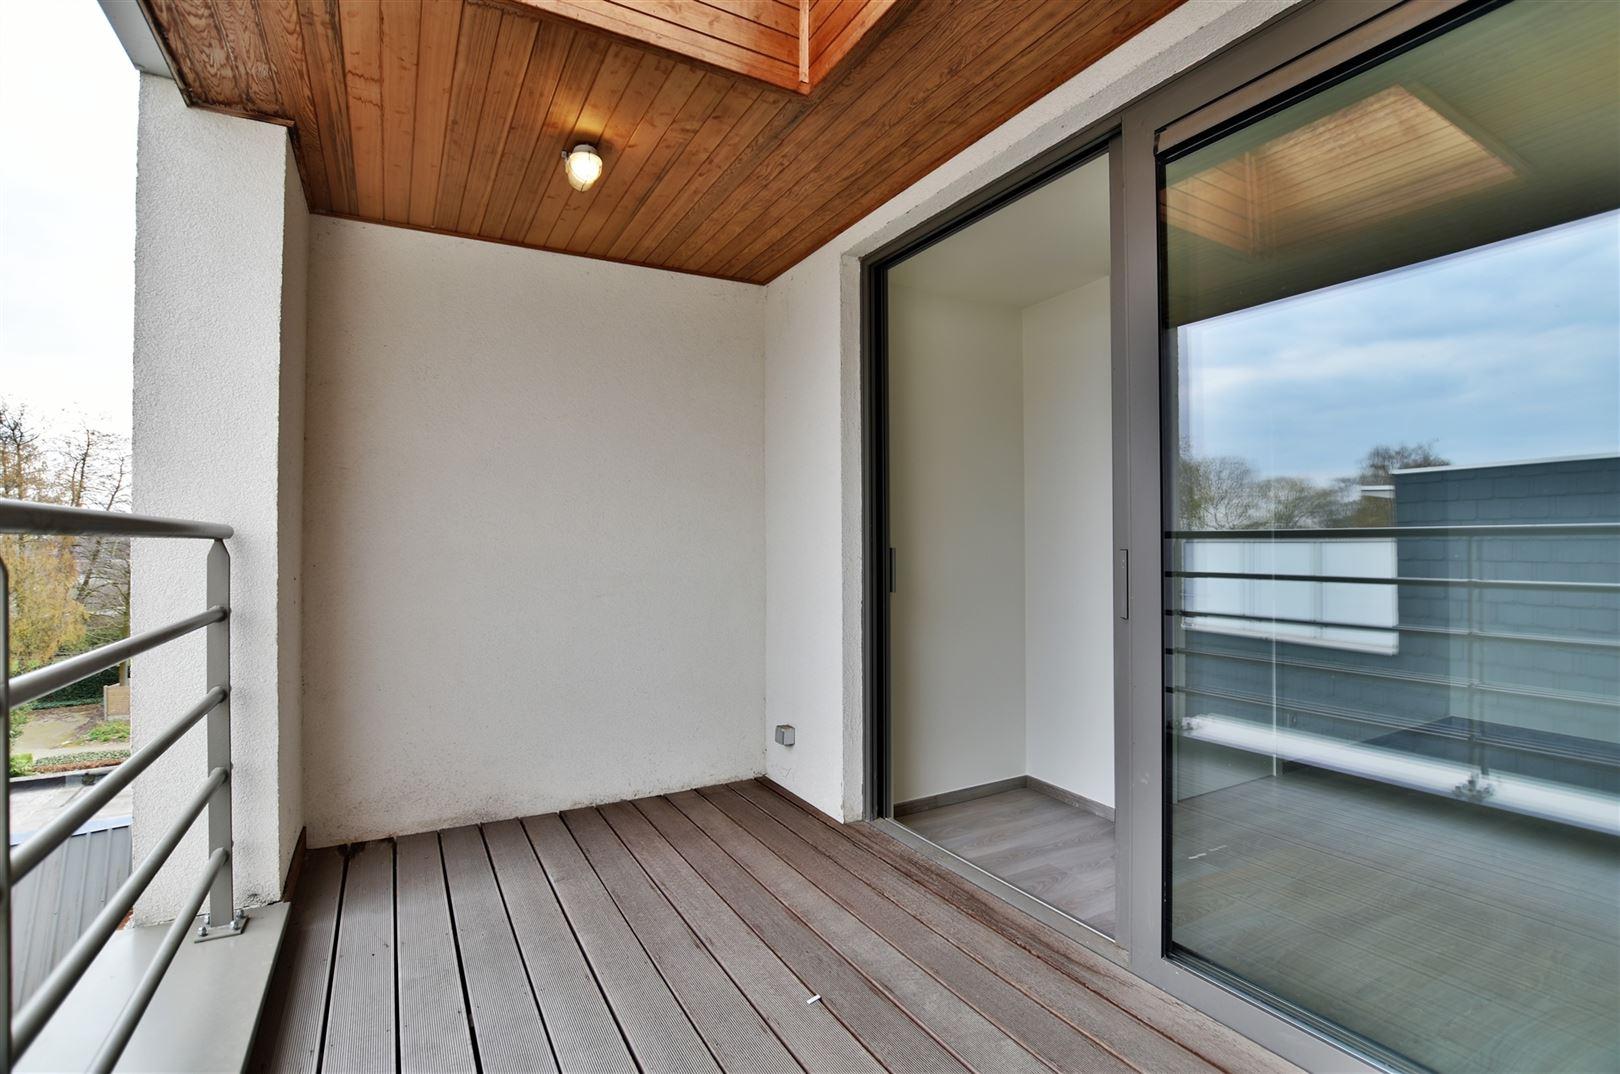 Foto 24 : Duplex/Penthouse te 9200 Sint-Gillis-bij-Dendermonde (België) - Prijs € 278.000